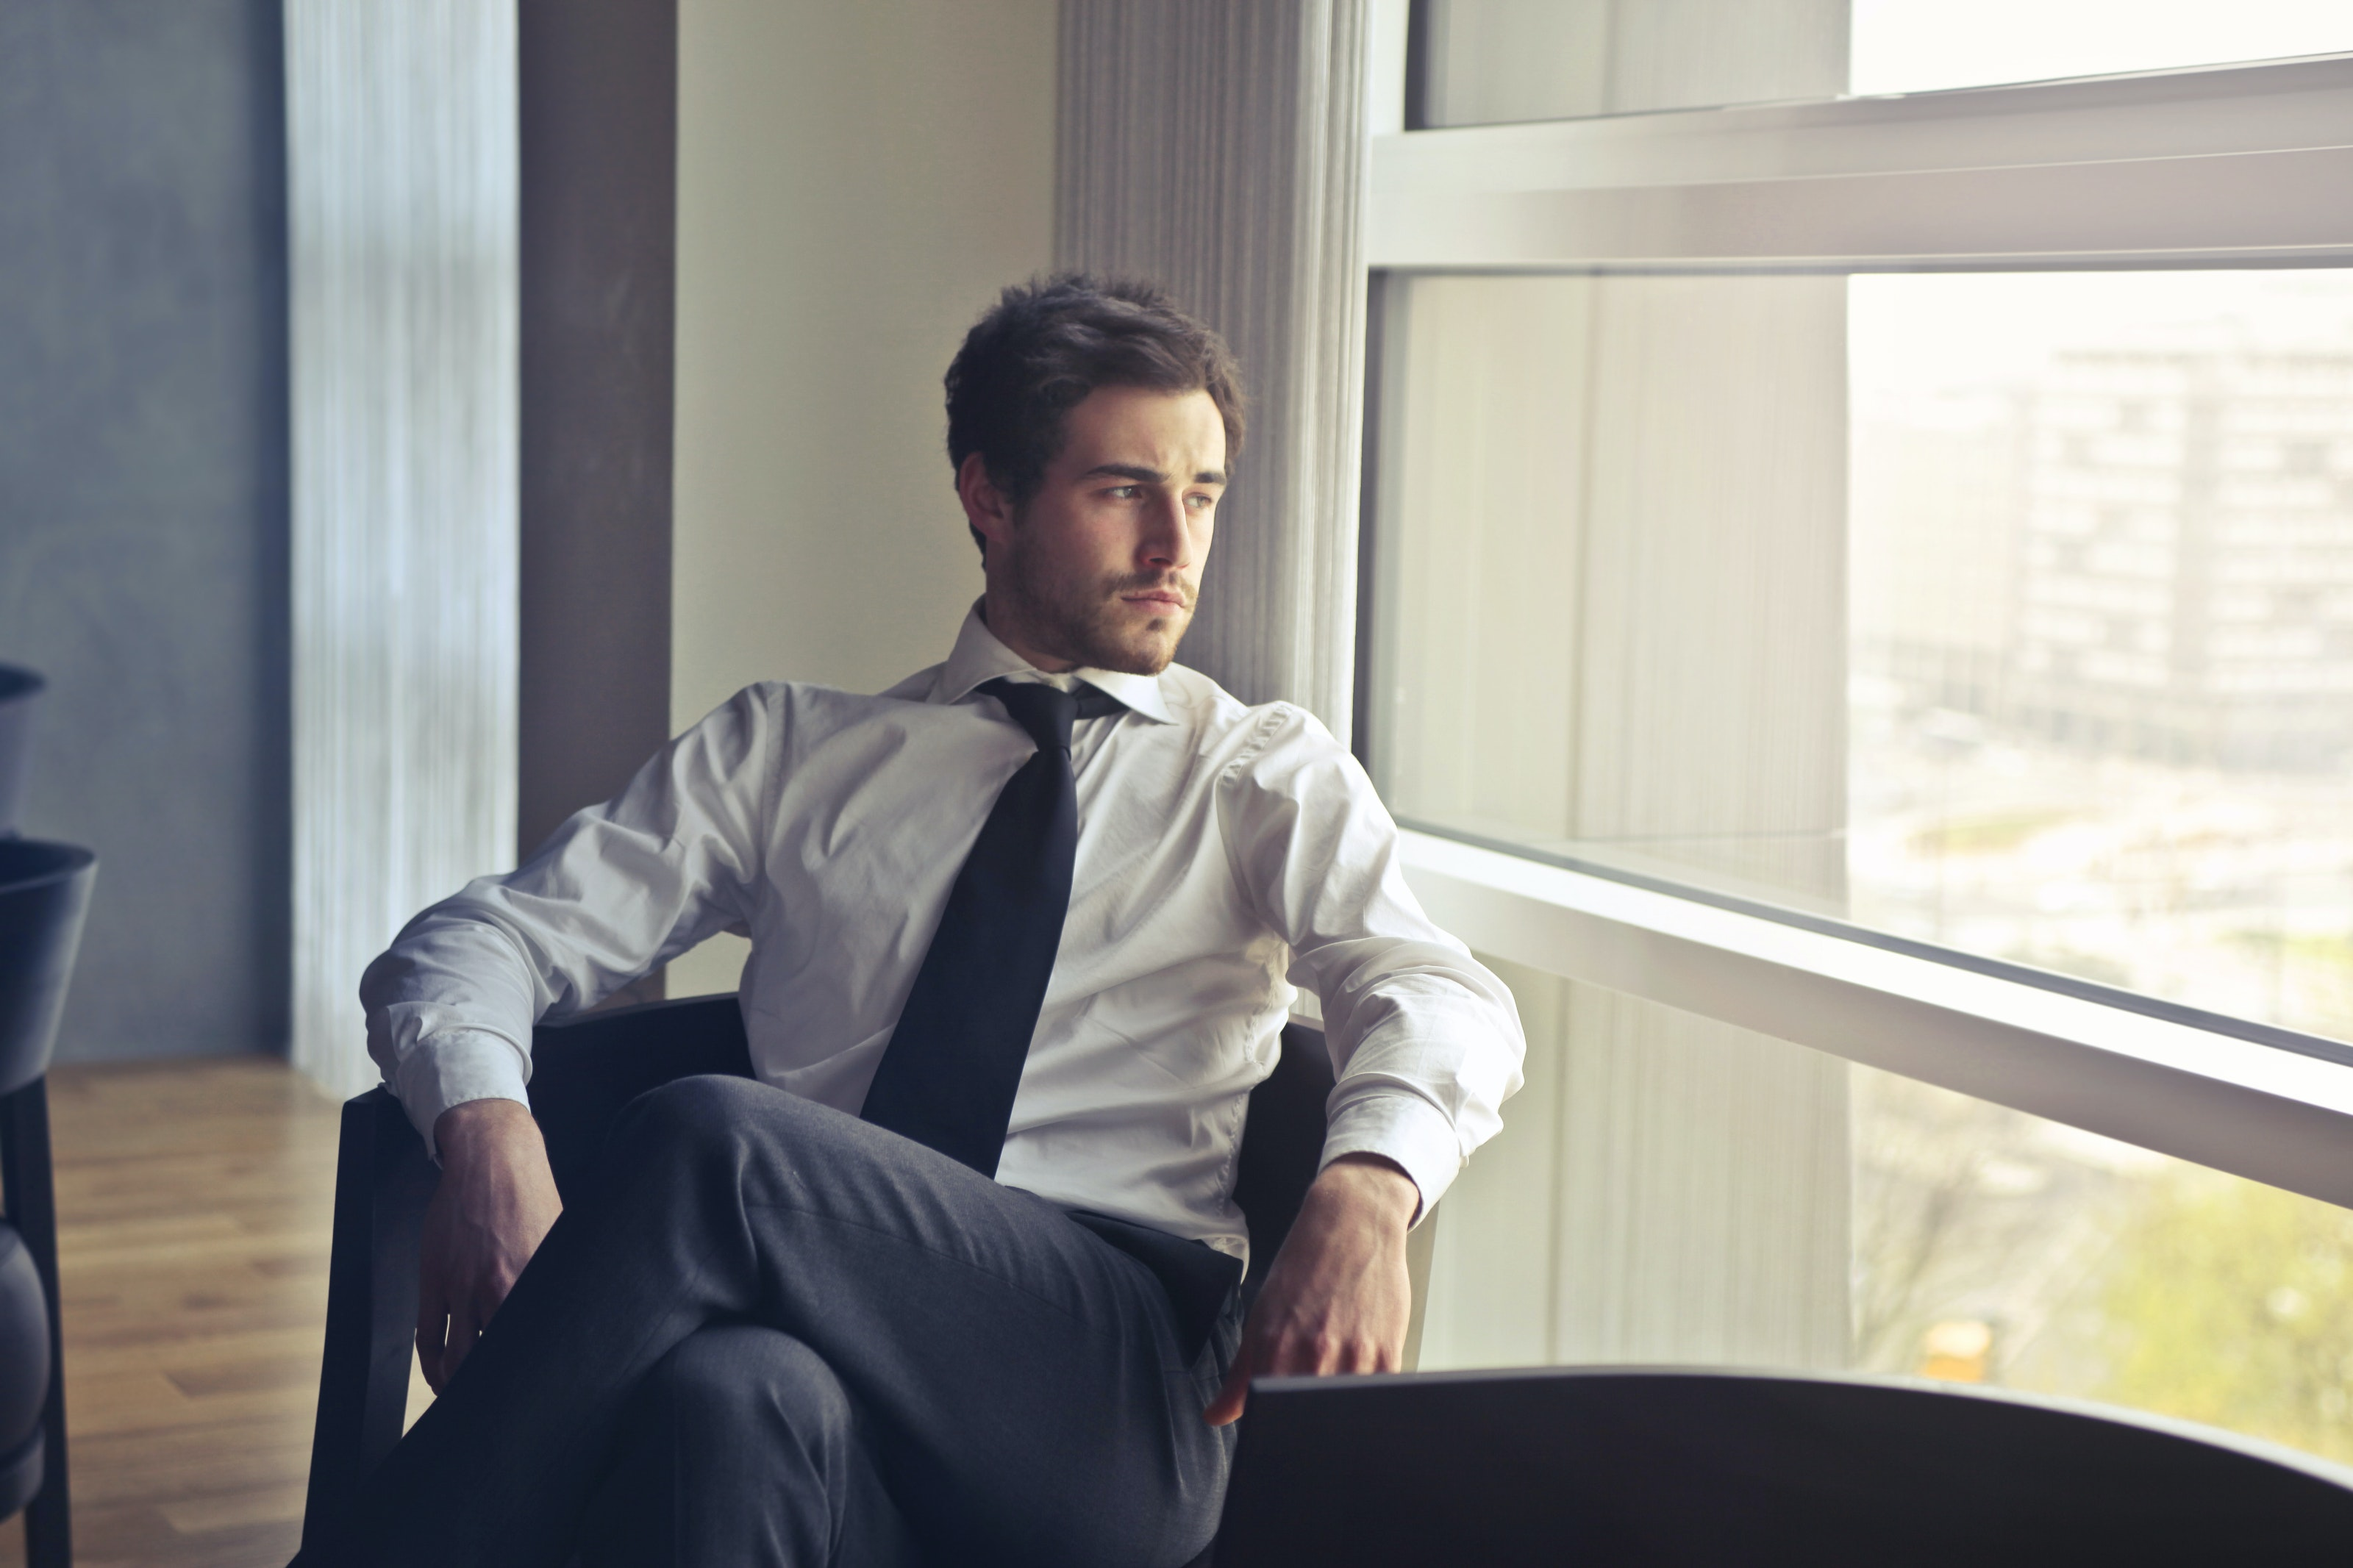 Hemden mit Krawatten - der perfekte Business-Look